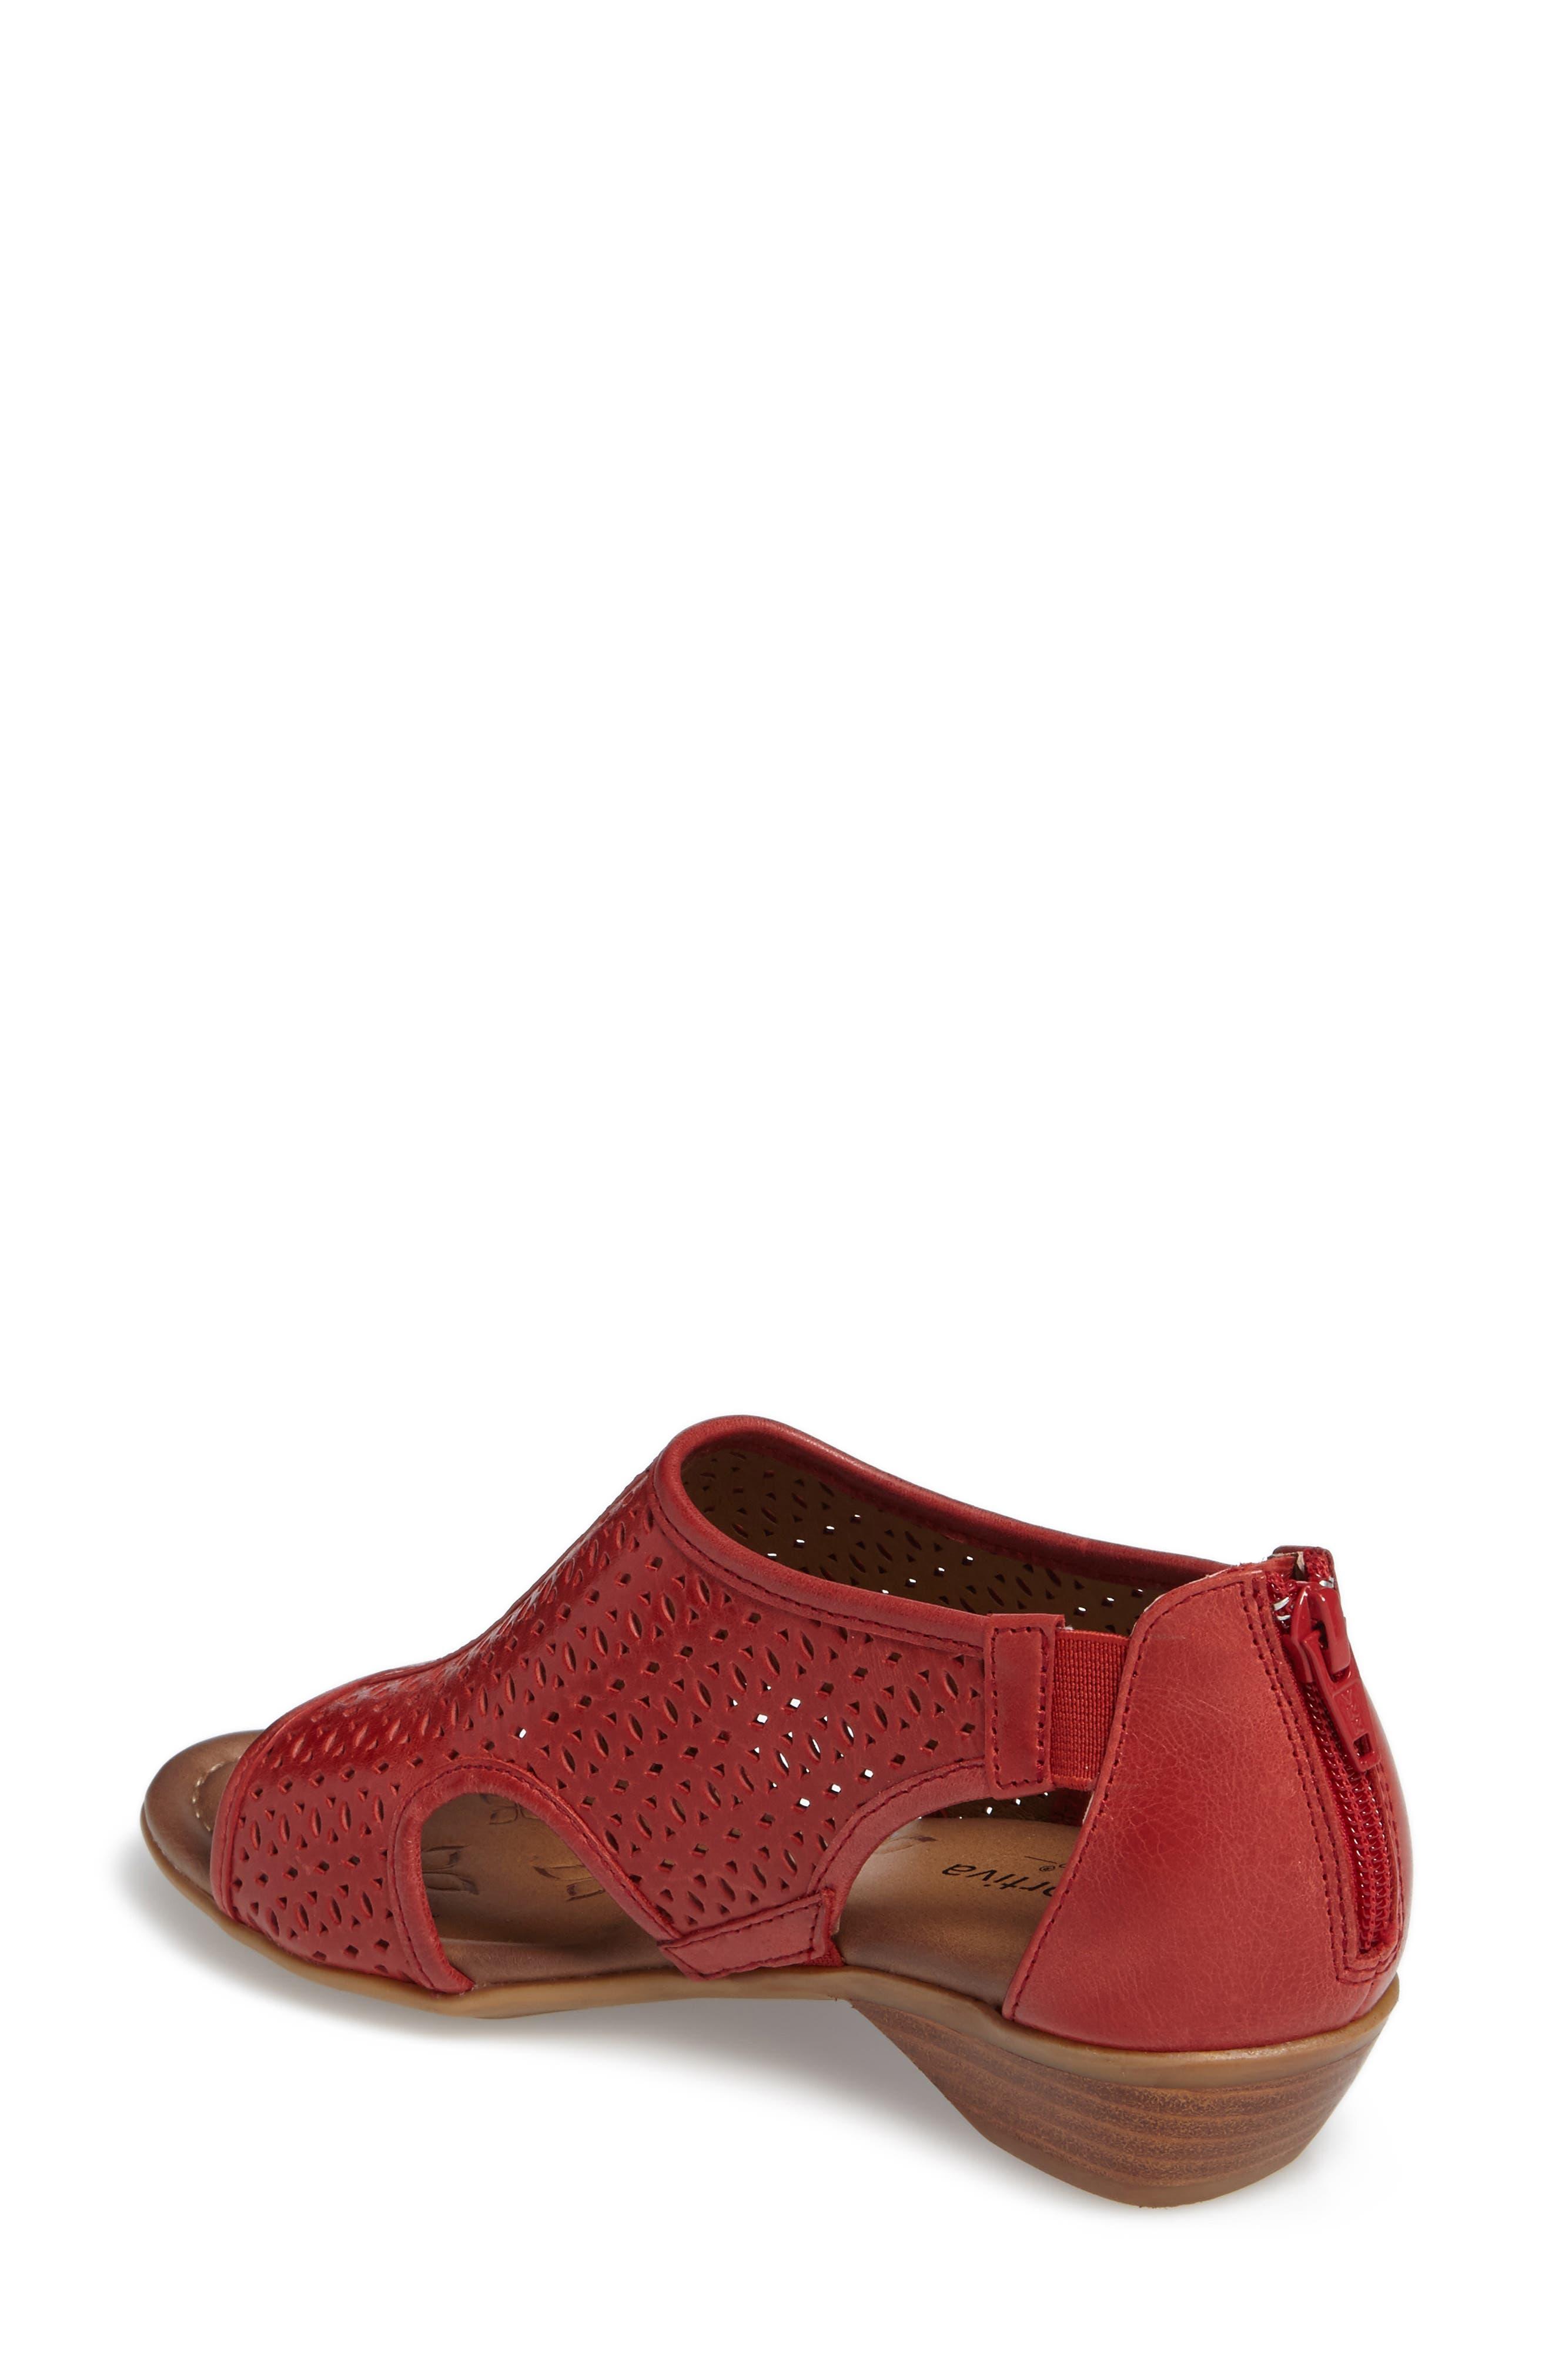 Rina Wedge Sandal,                             Alternate thumbnail 6, color,